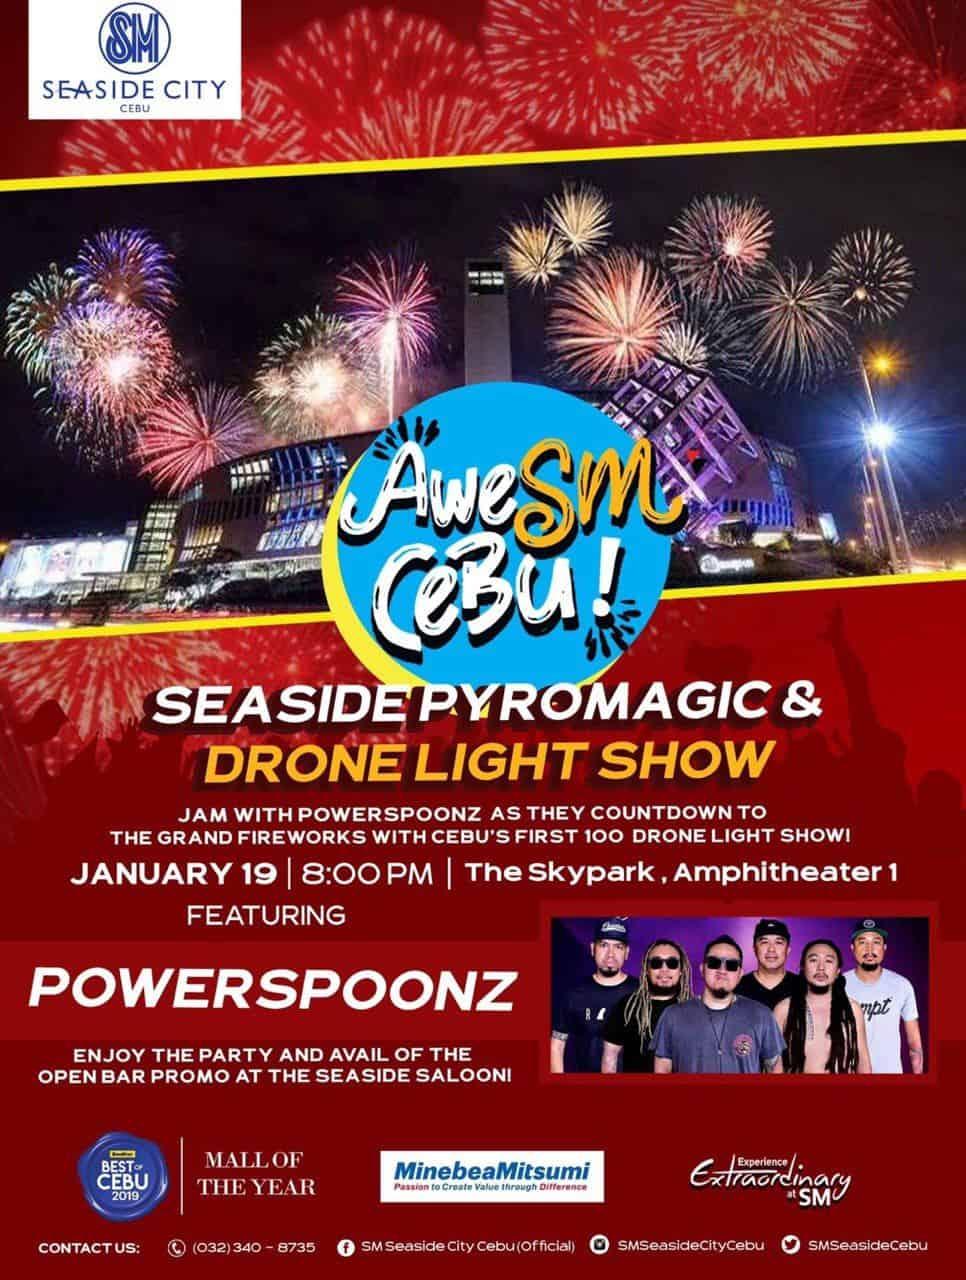 Sinulog-SM-Seaside-Powerspoonz-Drone-Light-Show-Cebu